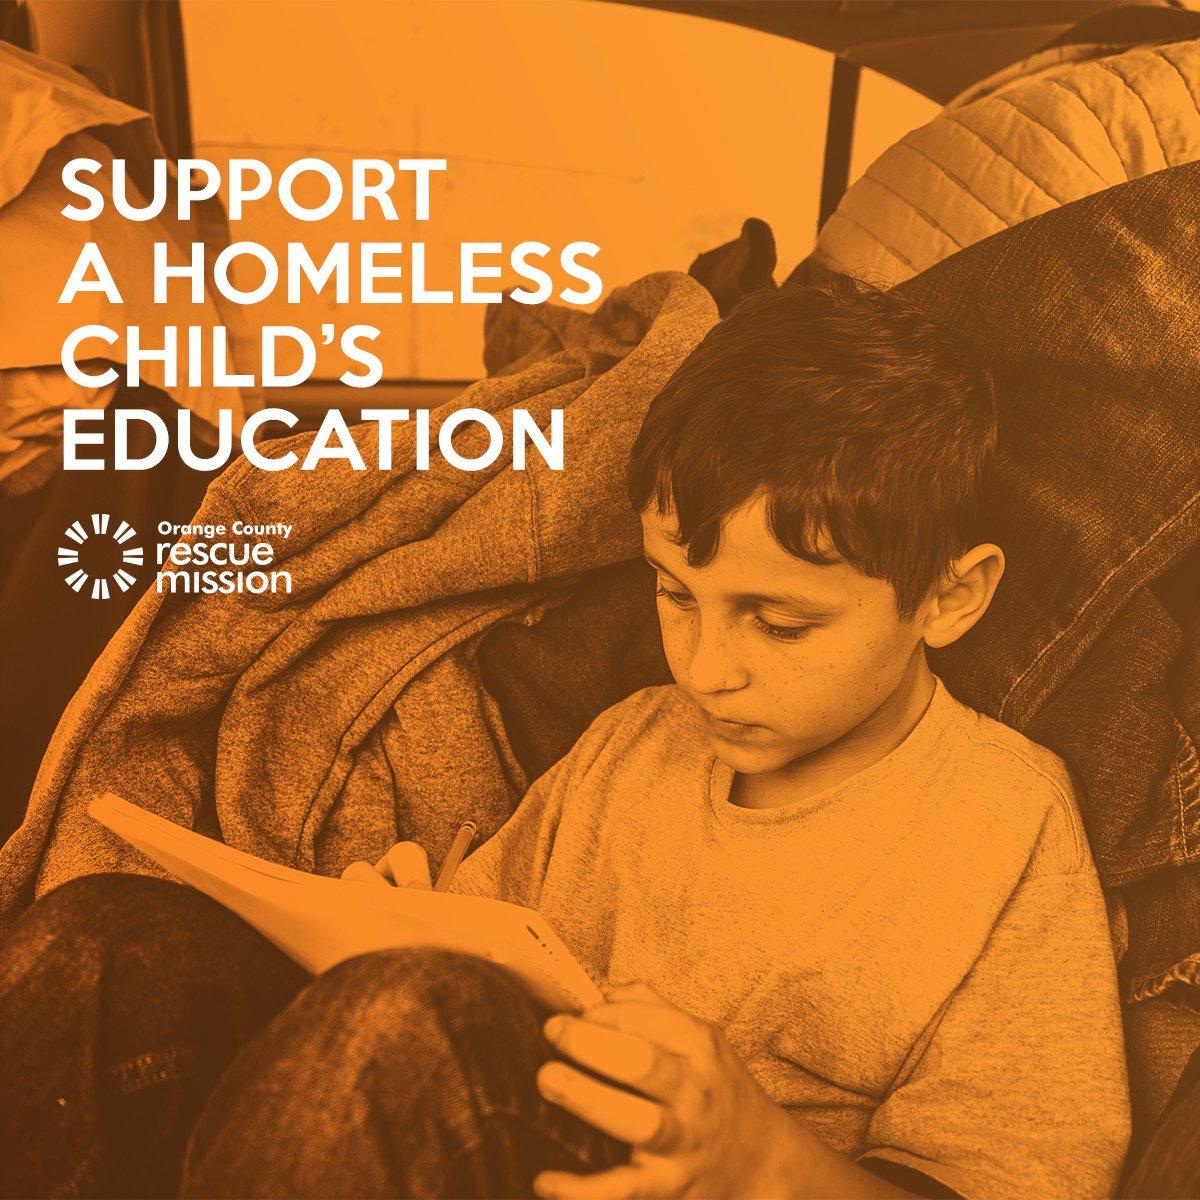 support homeless childrens education